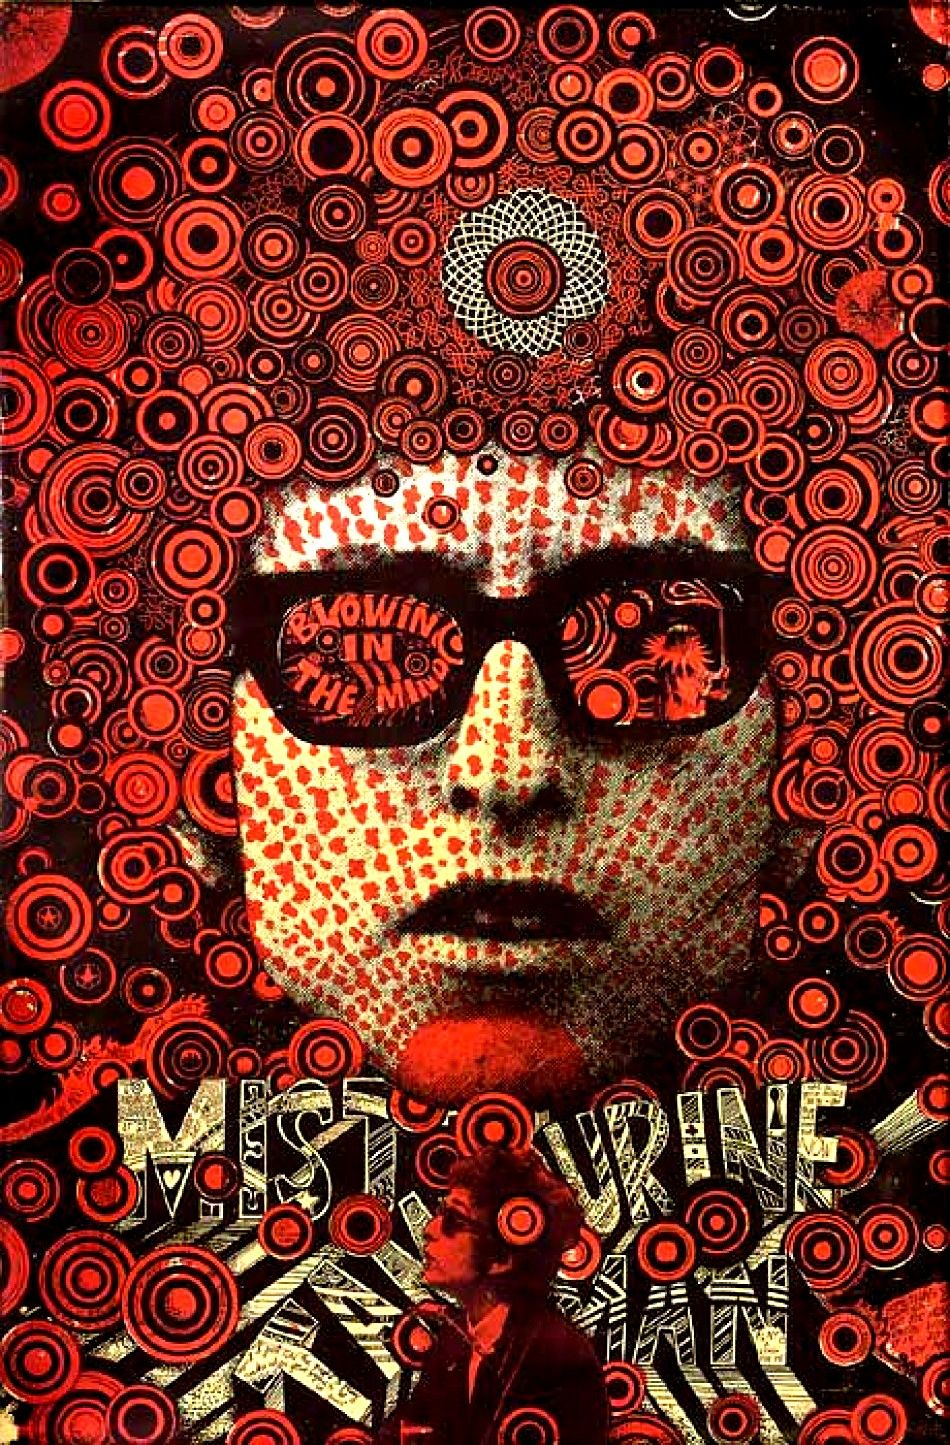 Mister Tambourine Man (Bob Dylan)